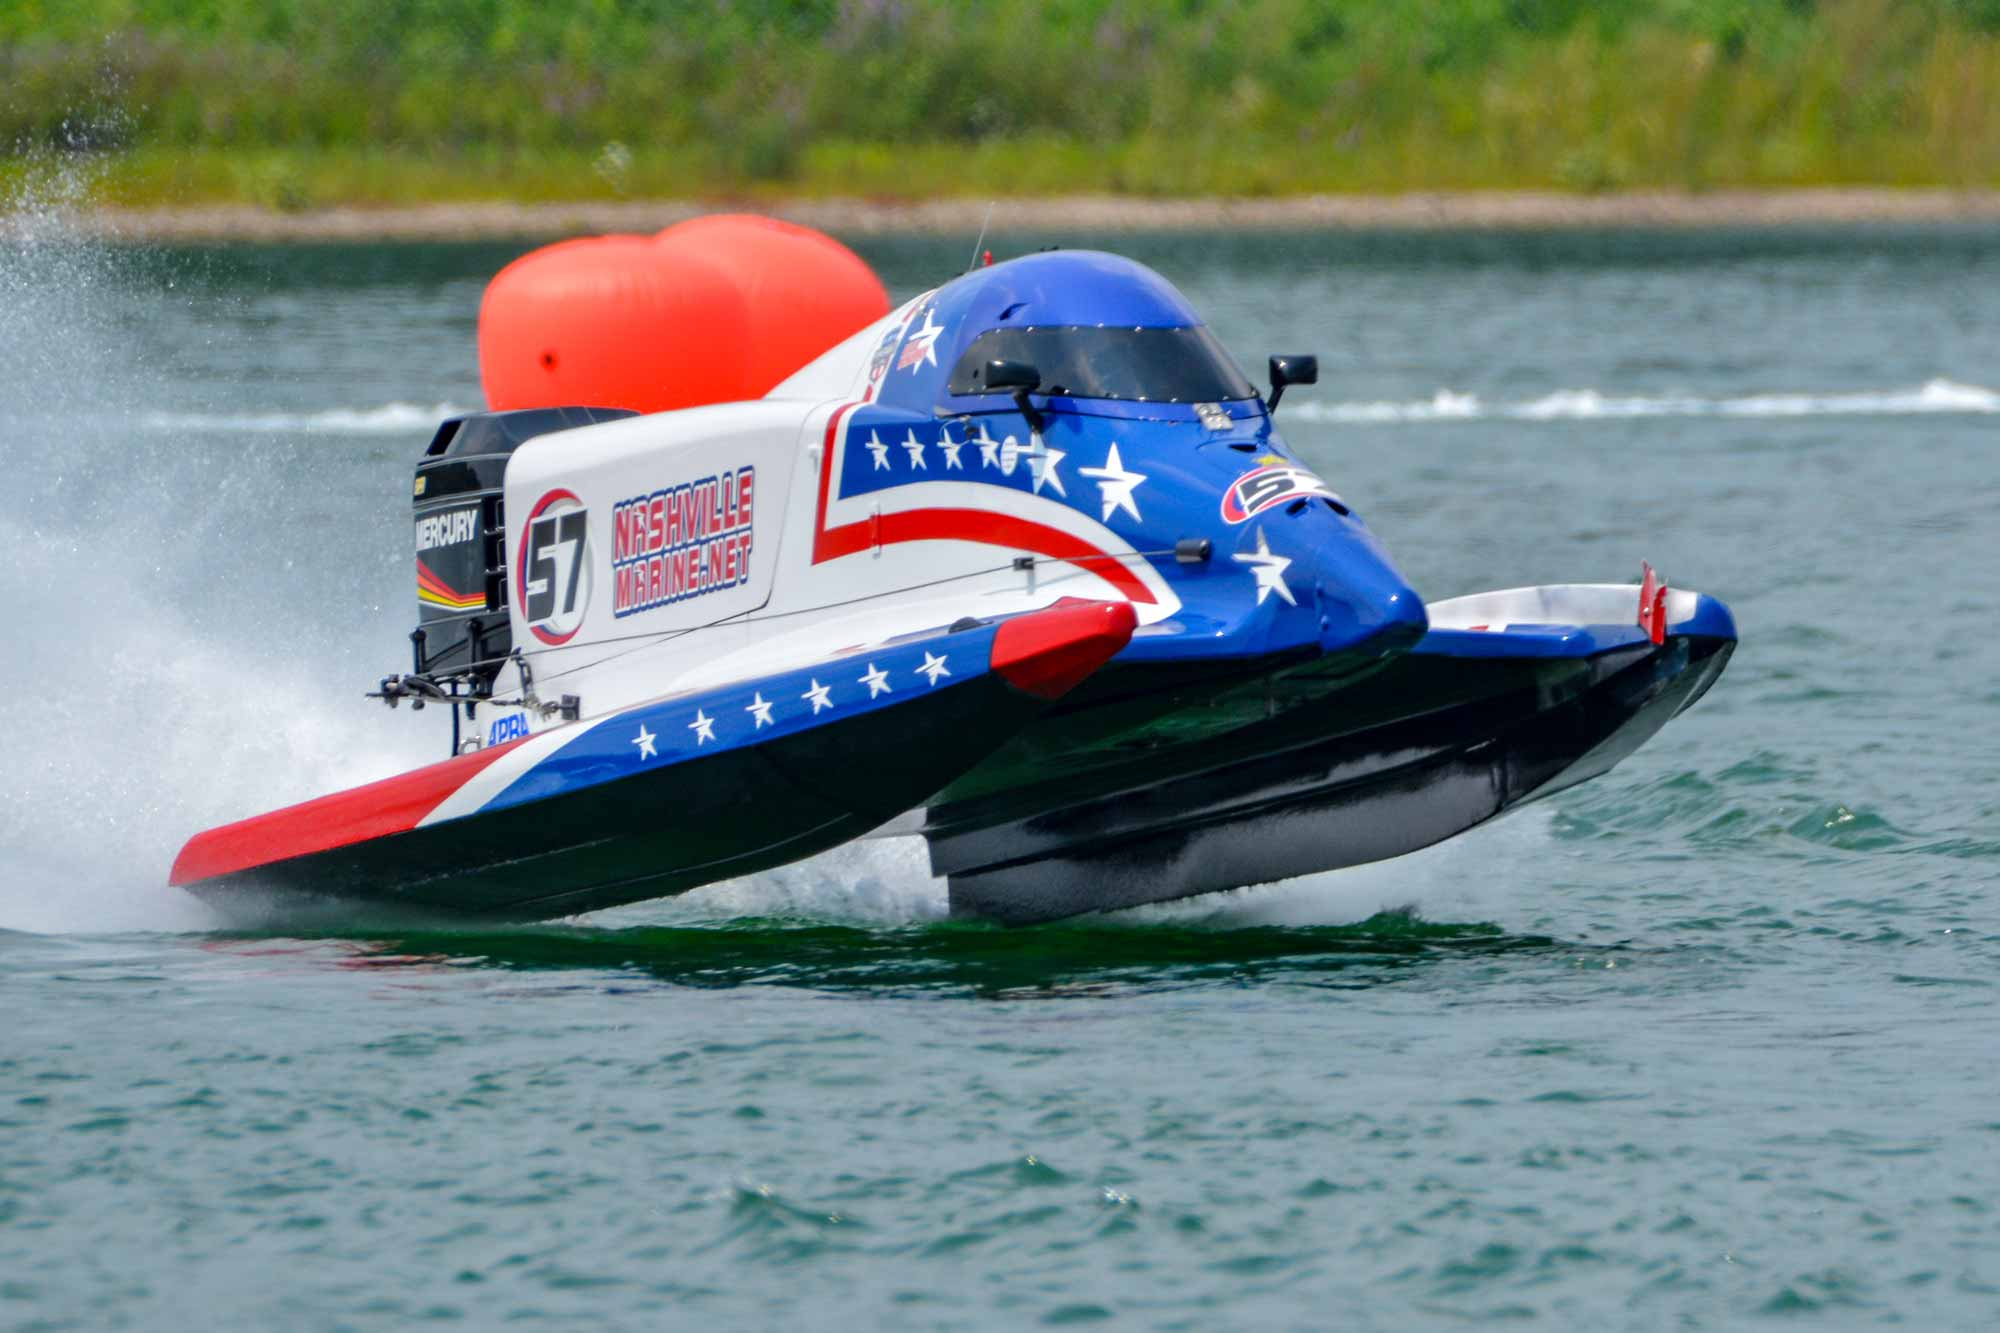 McMurray-Racing-Nashvill-Marine-2021-Springfield-F1-Race-11